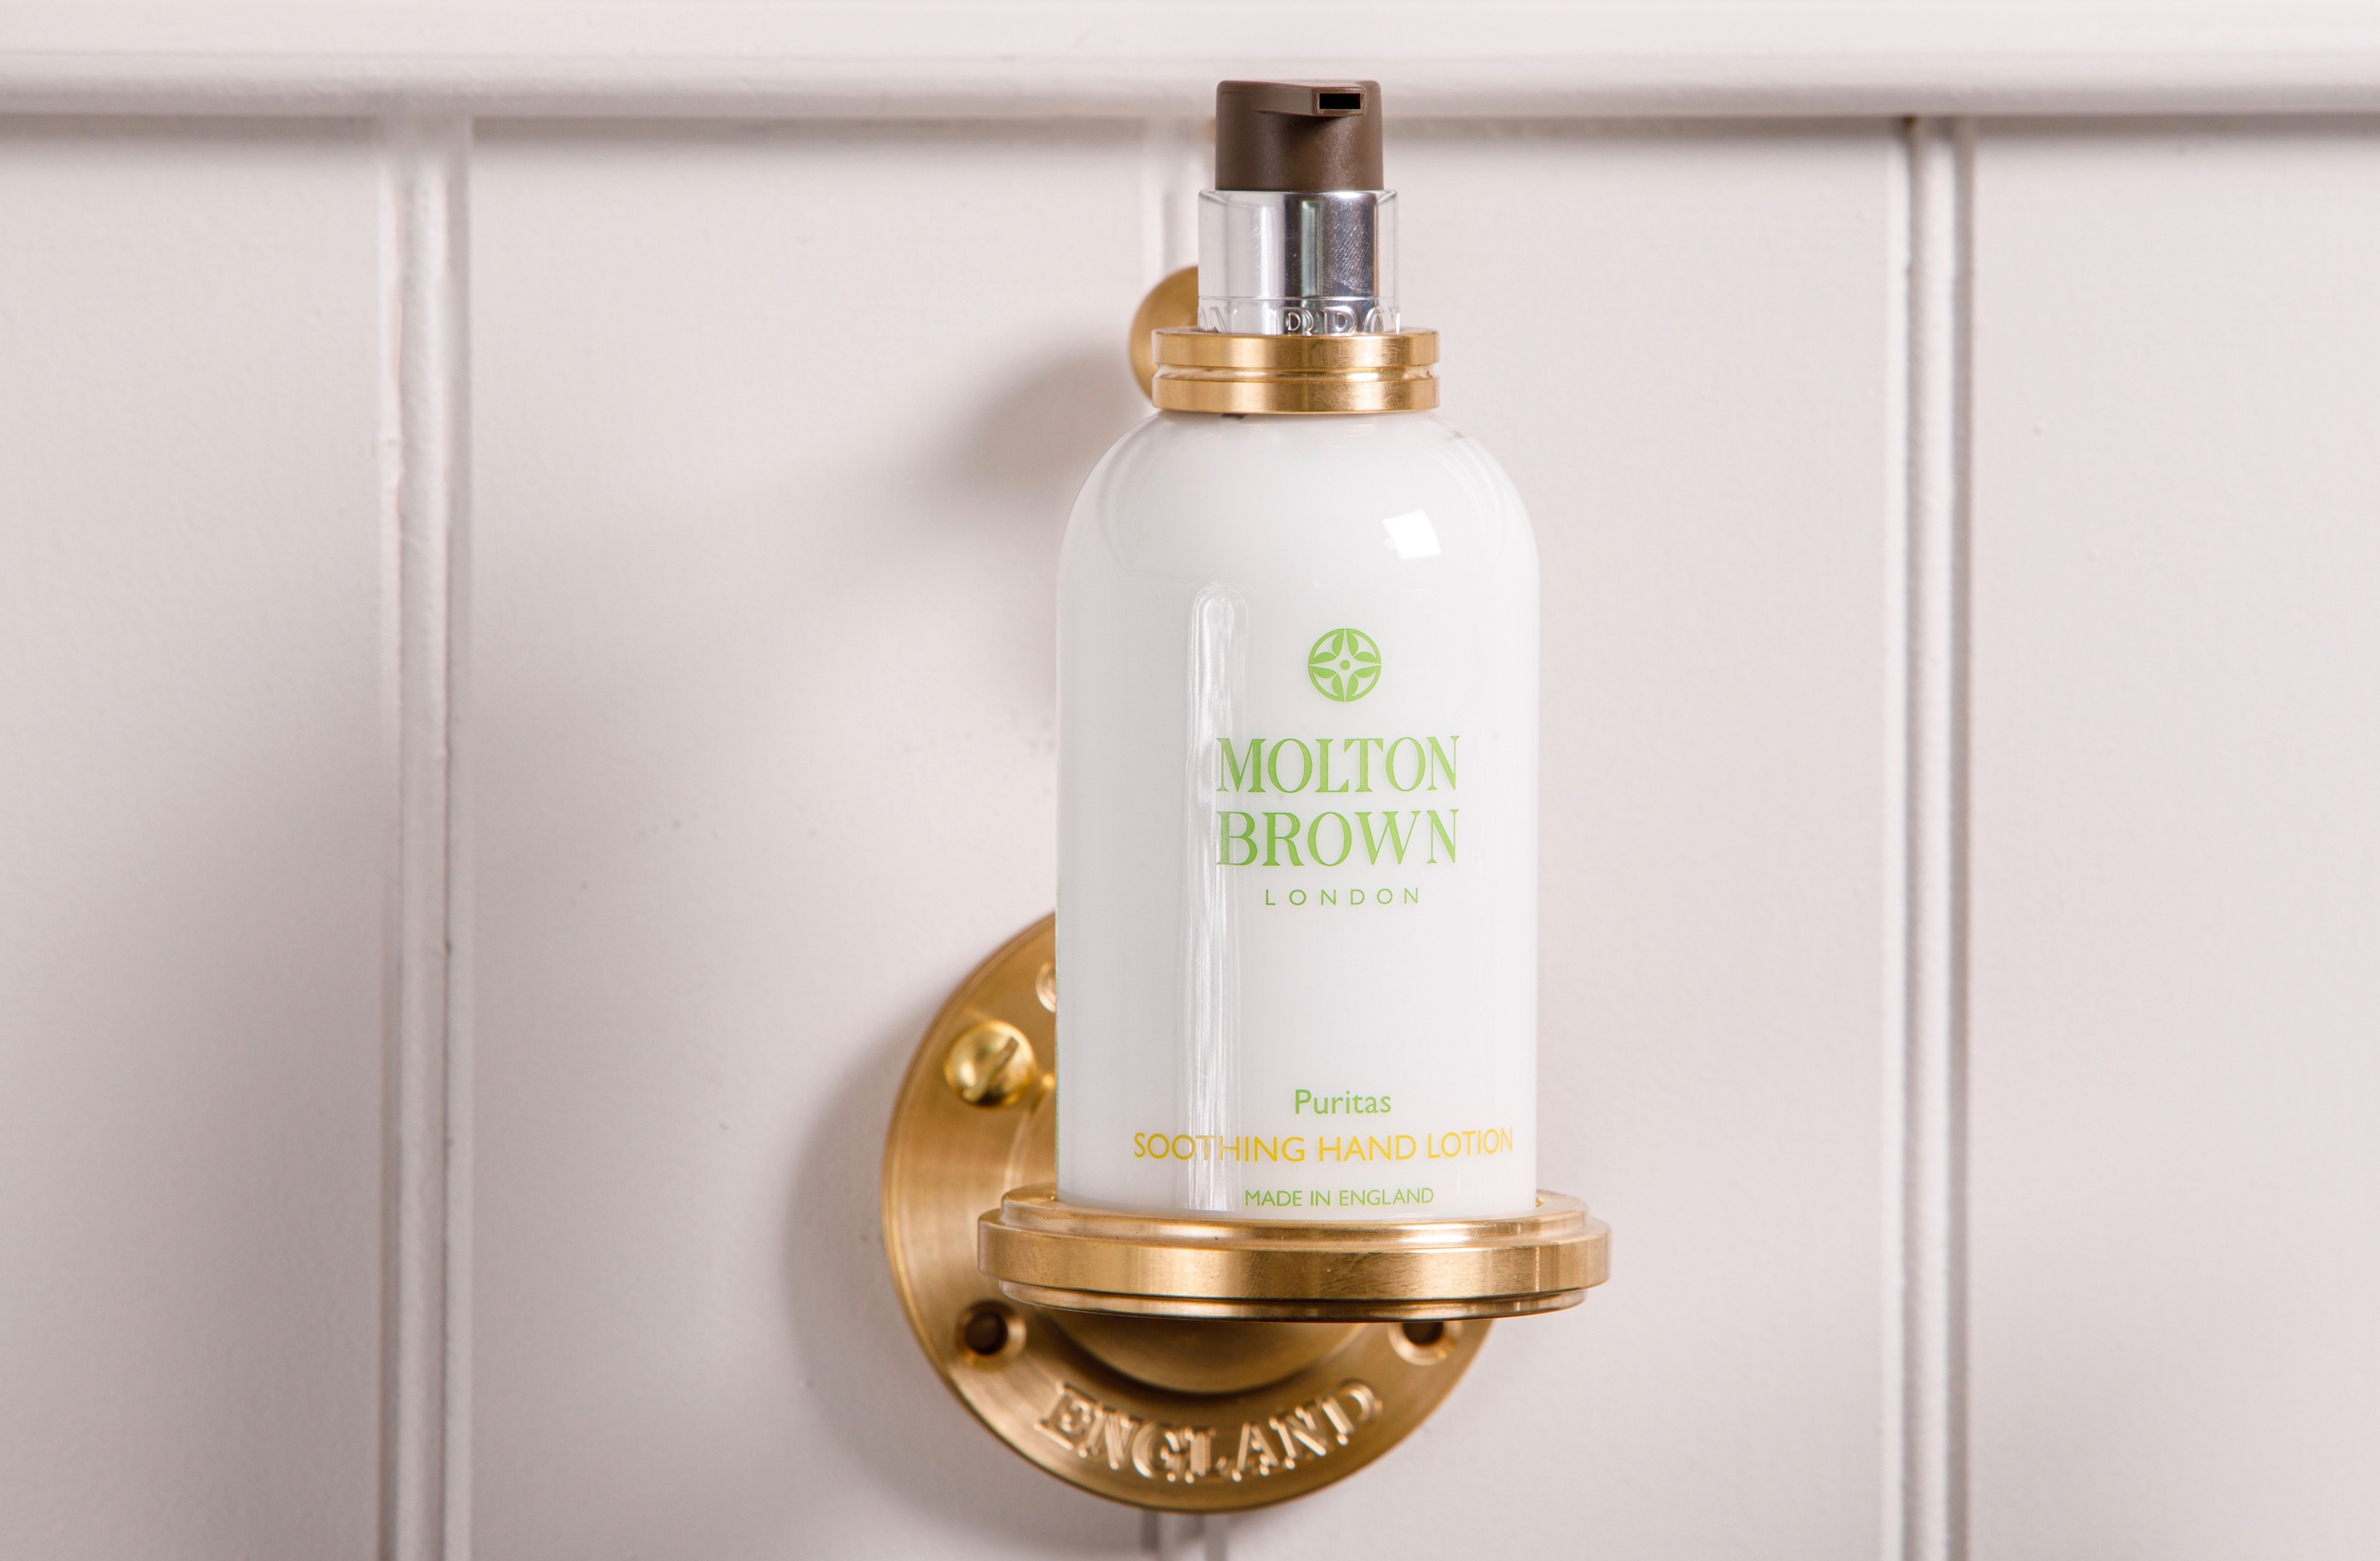 molton brown soap bottle holder bathroom accessory luxury bathroom